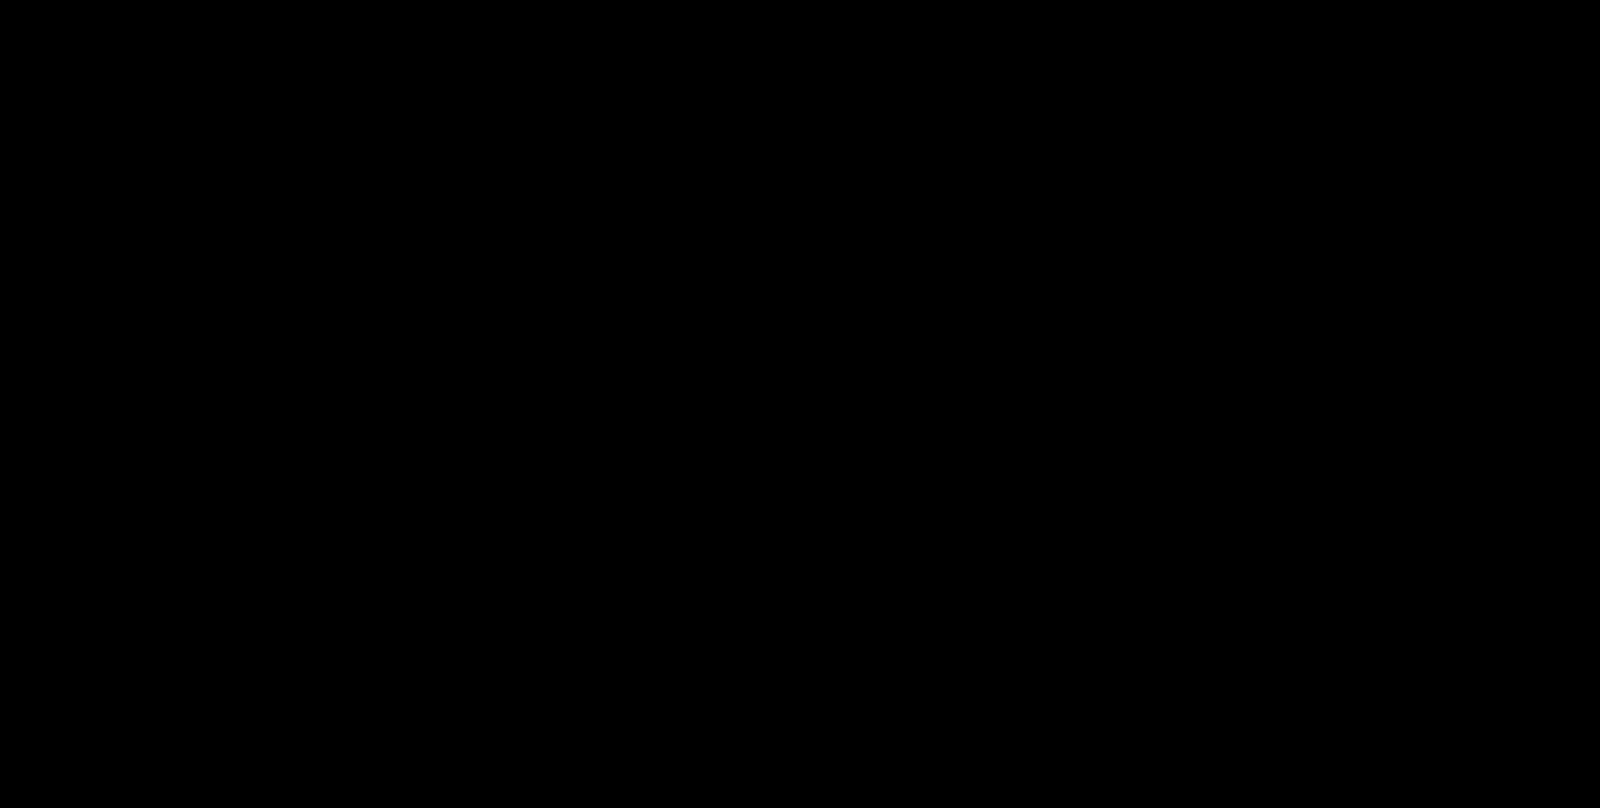 Promenade Diptyque – Huile sur toile 90×180 cm 2015